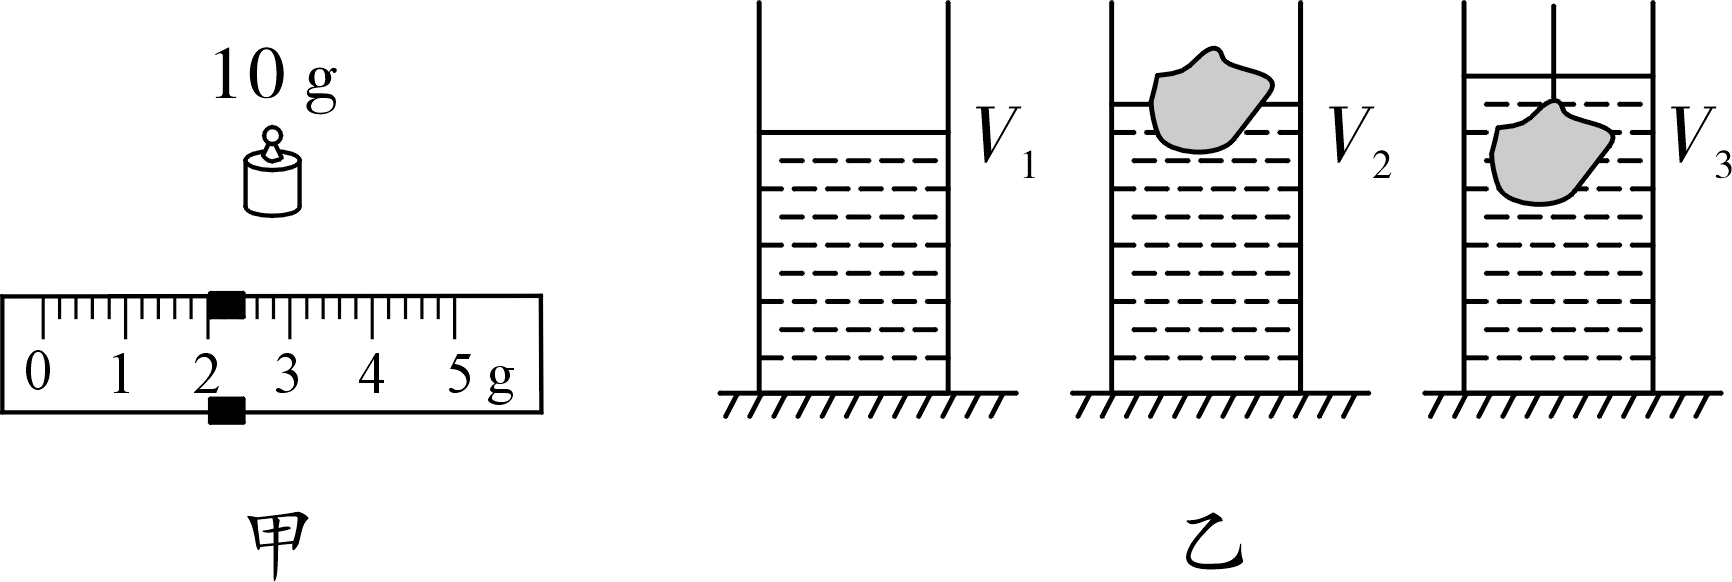 E:\物理(勿动)\2021河南试题研究fbd\2021河南物理(练)\薛程河南物理65.TIF